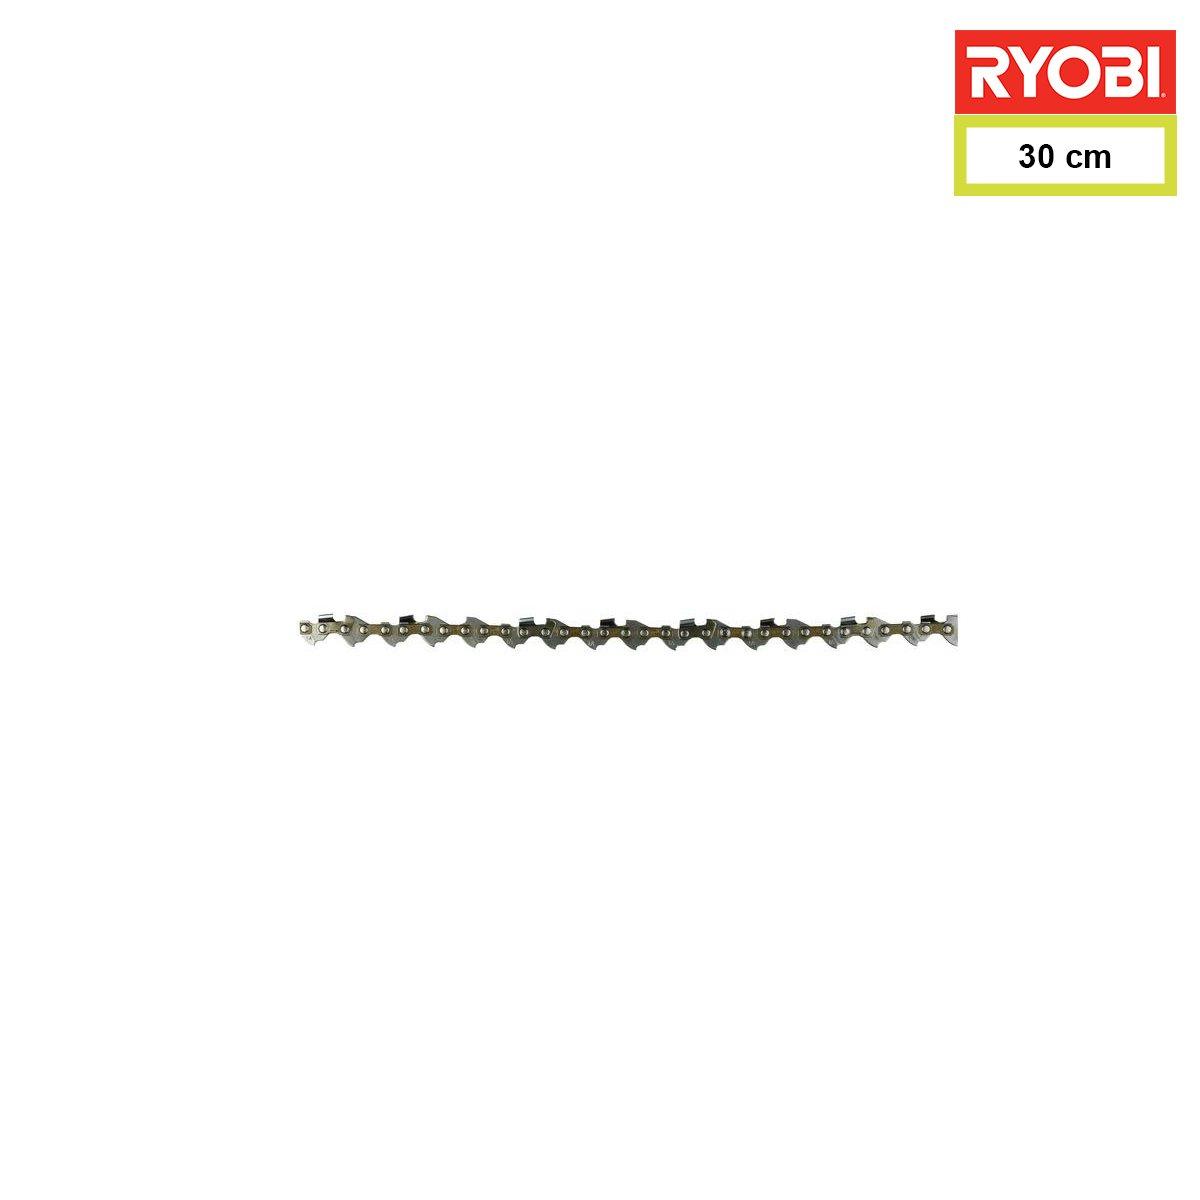 Chaine 30 cm (3,8 - 1,3 mm) pour gamme 36 v Ryobi rac227